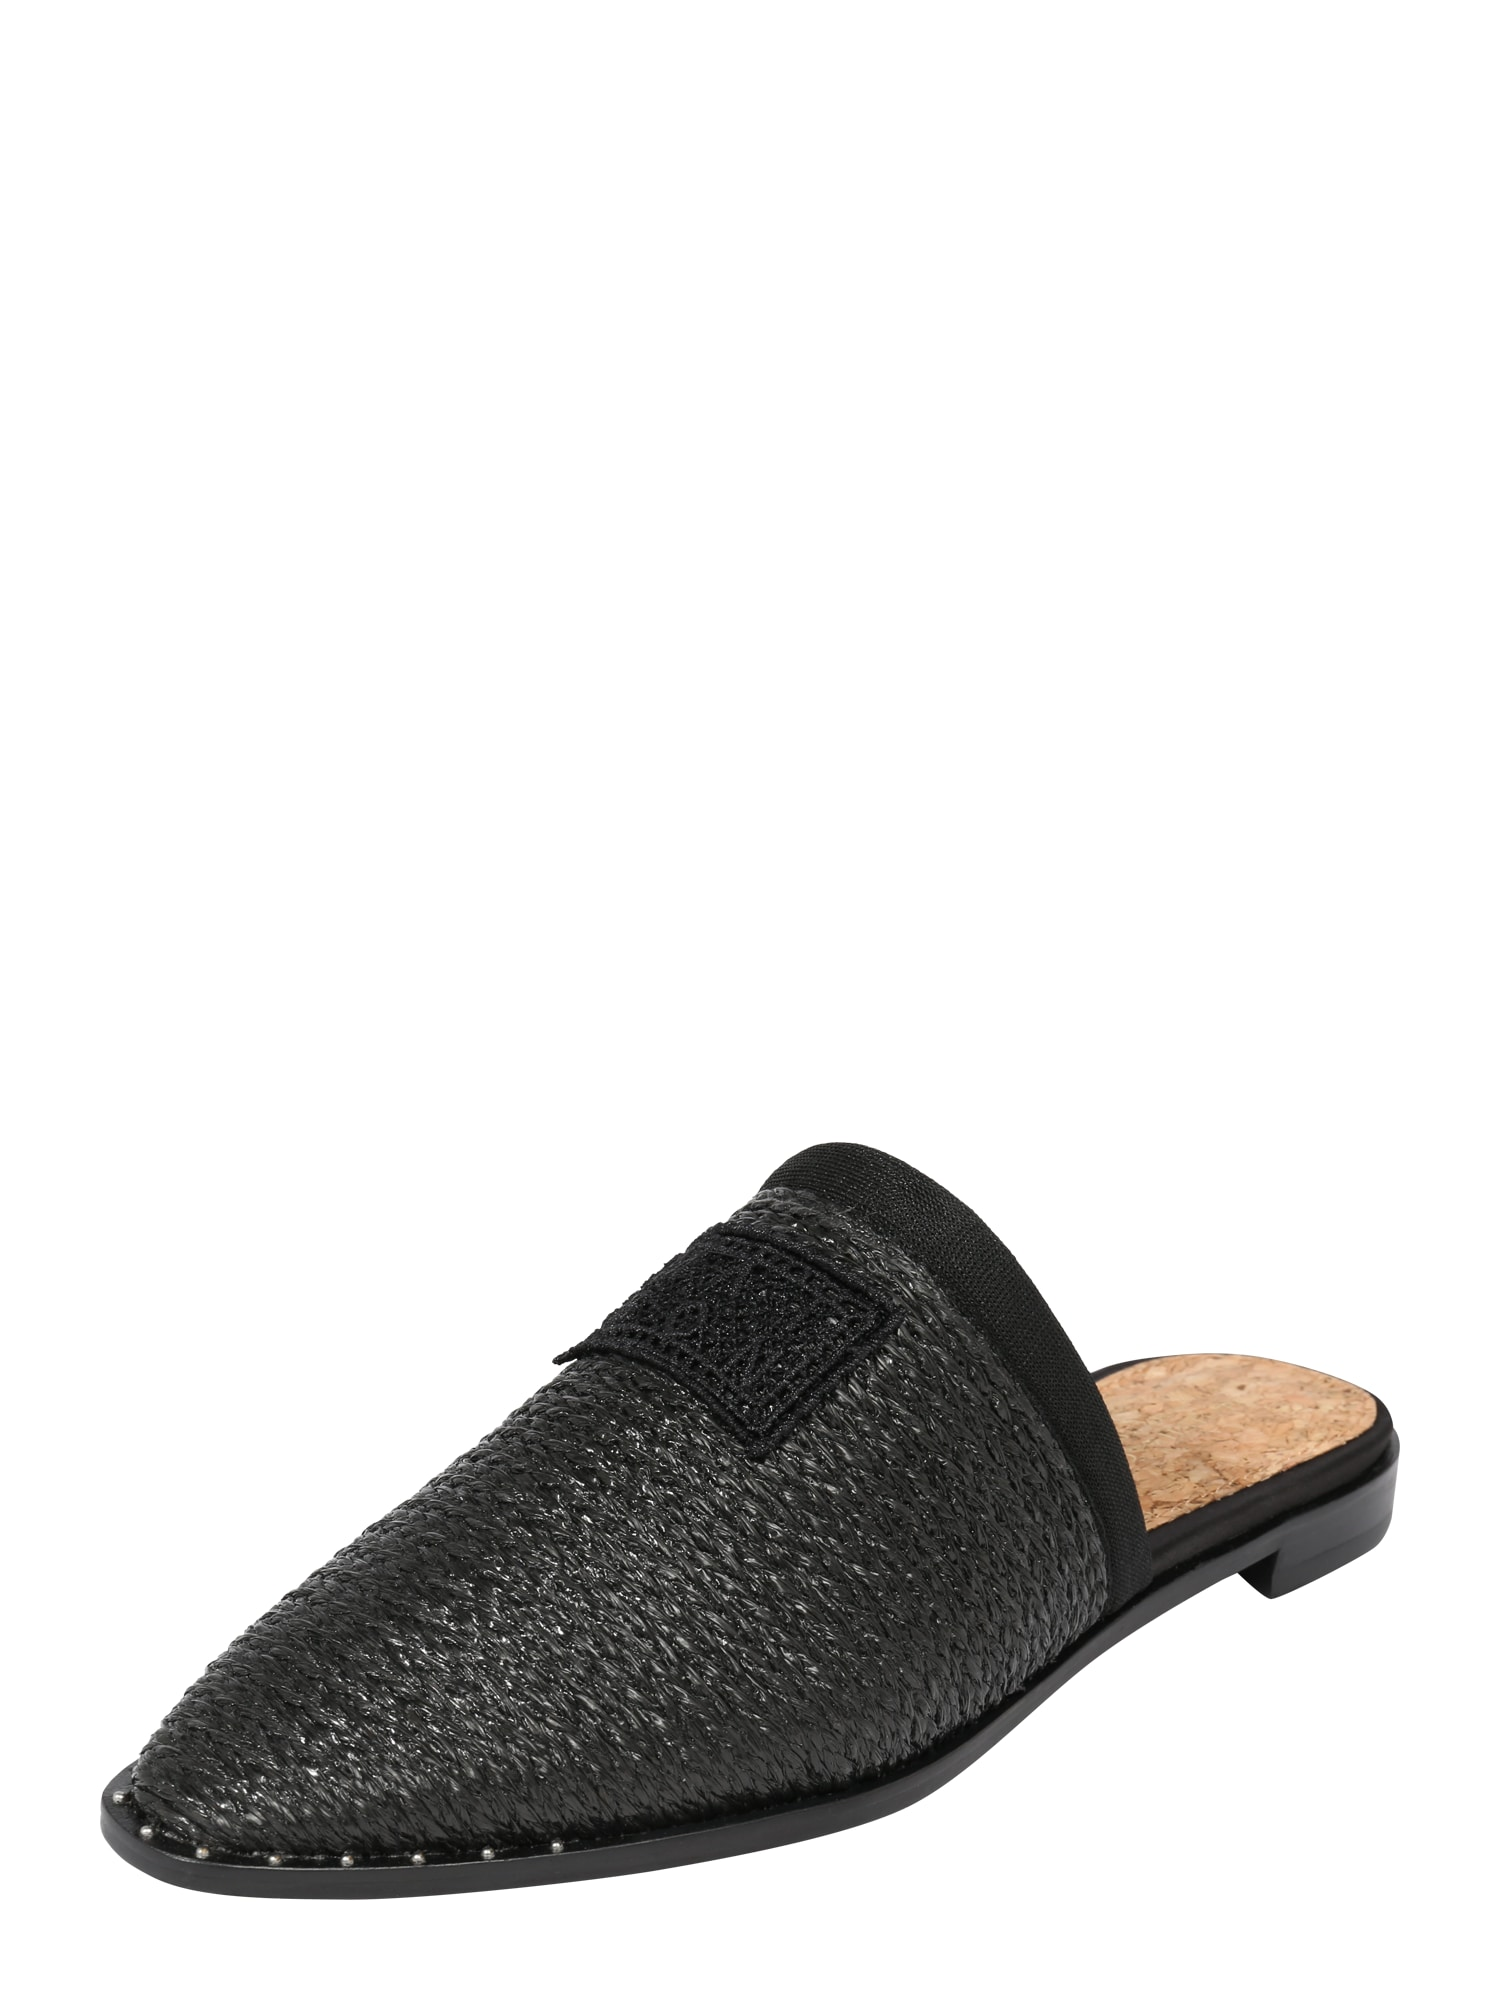 Pantofle Kalin Textile Mule černá SCOTCH & SODA